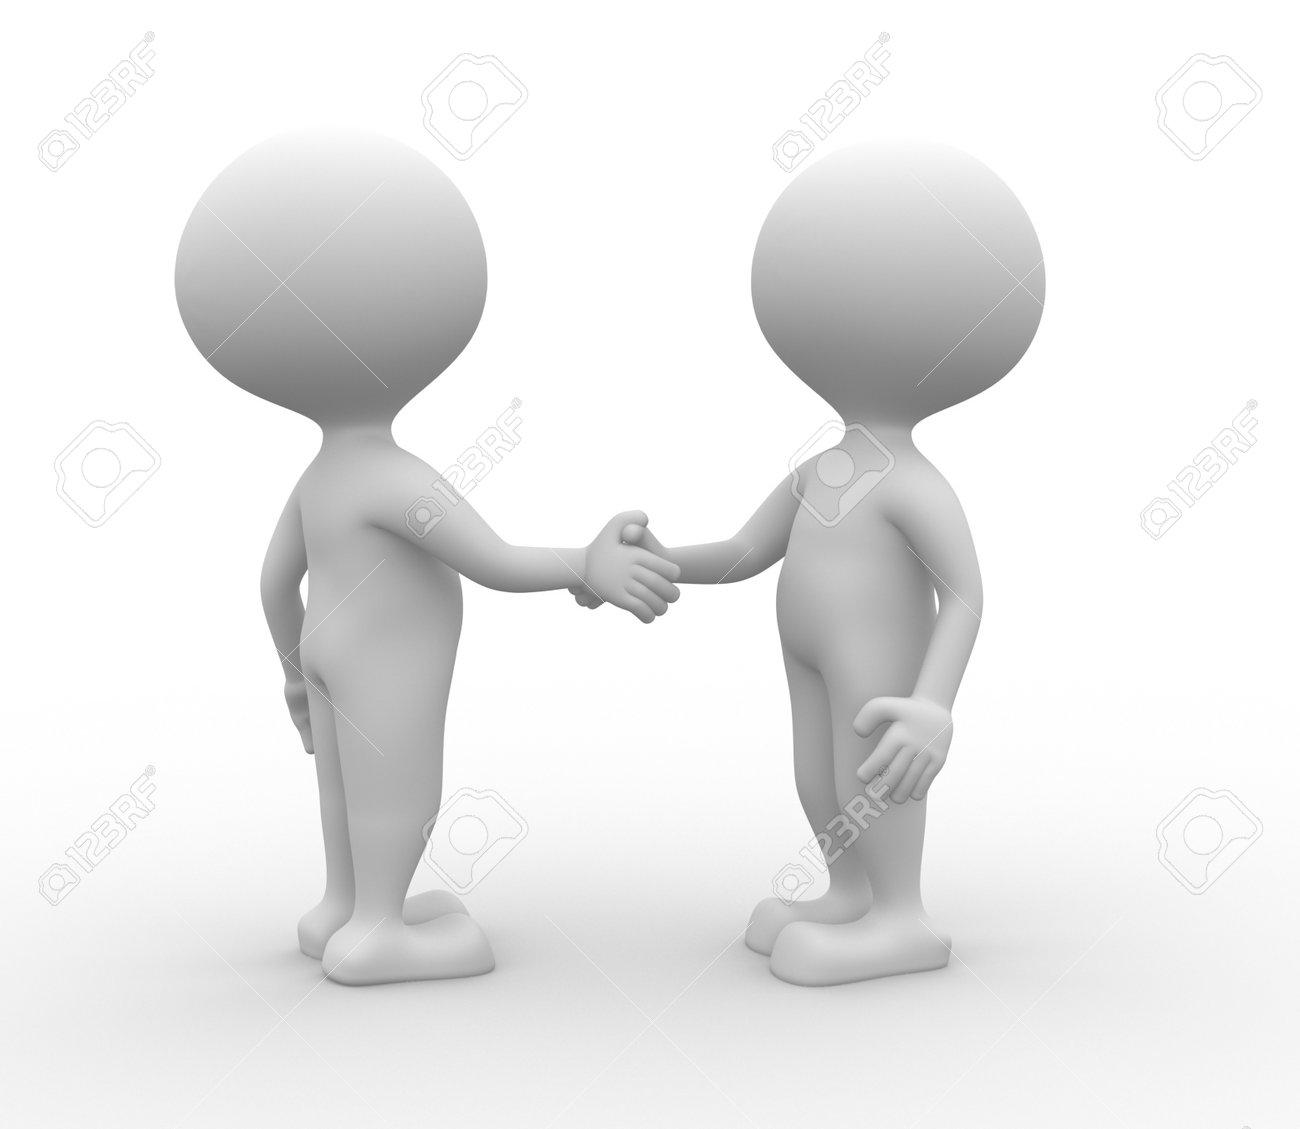 3d people - man, person partnership - handshake. Stock Photo - 21138651